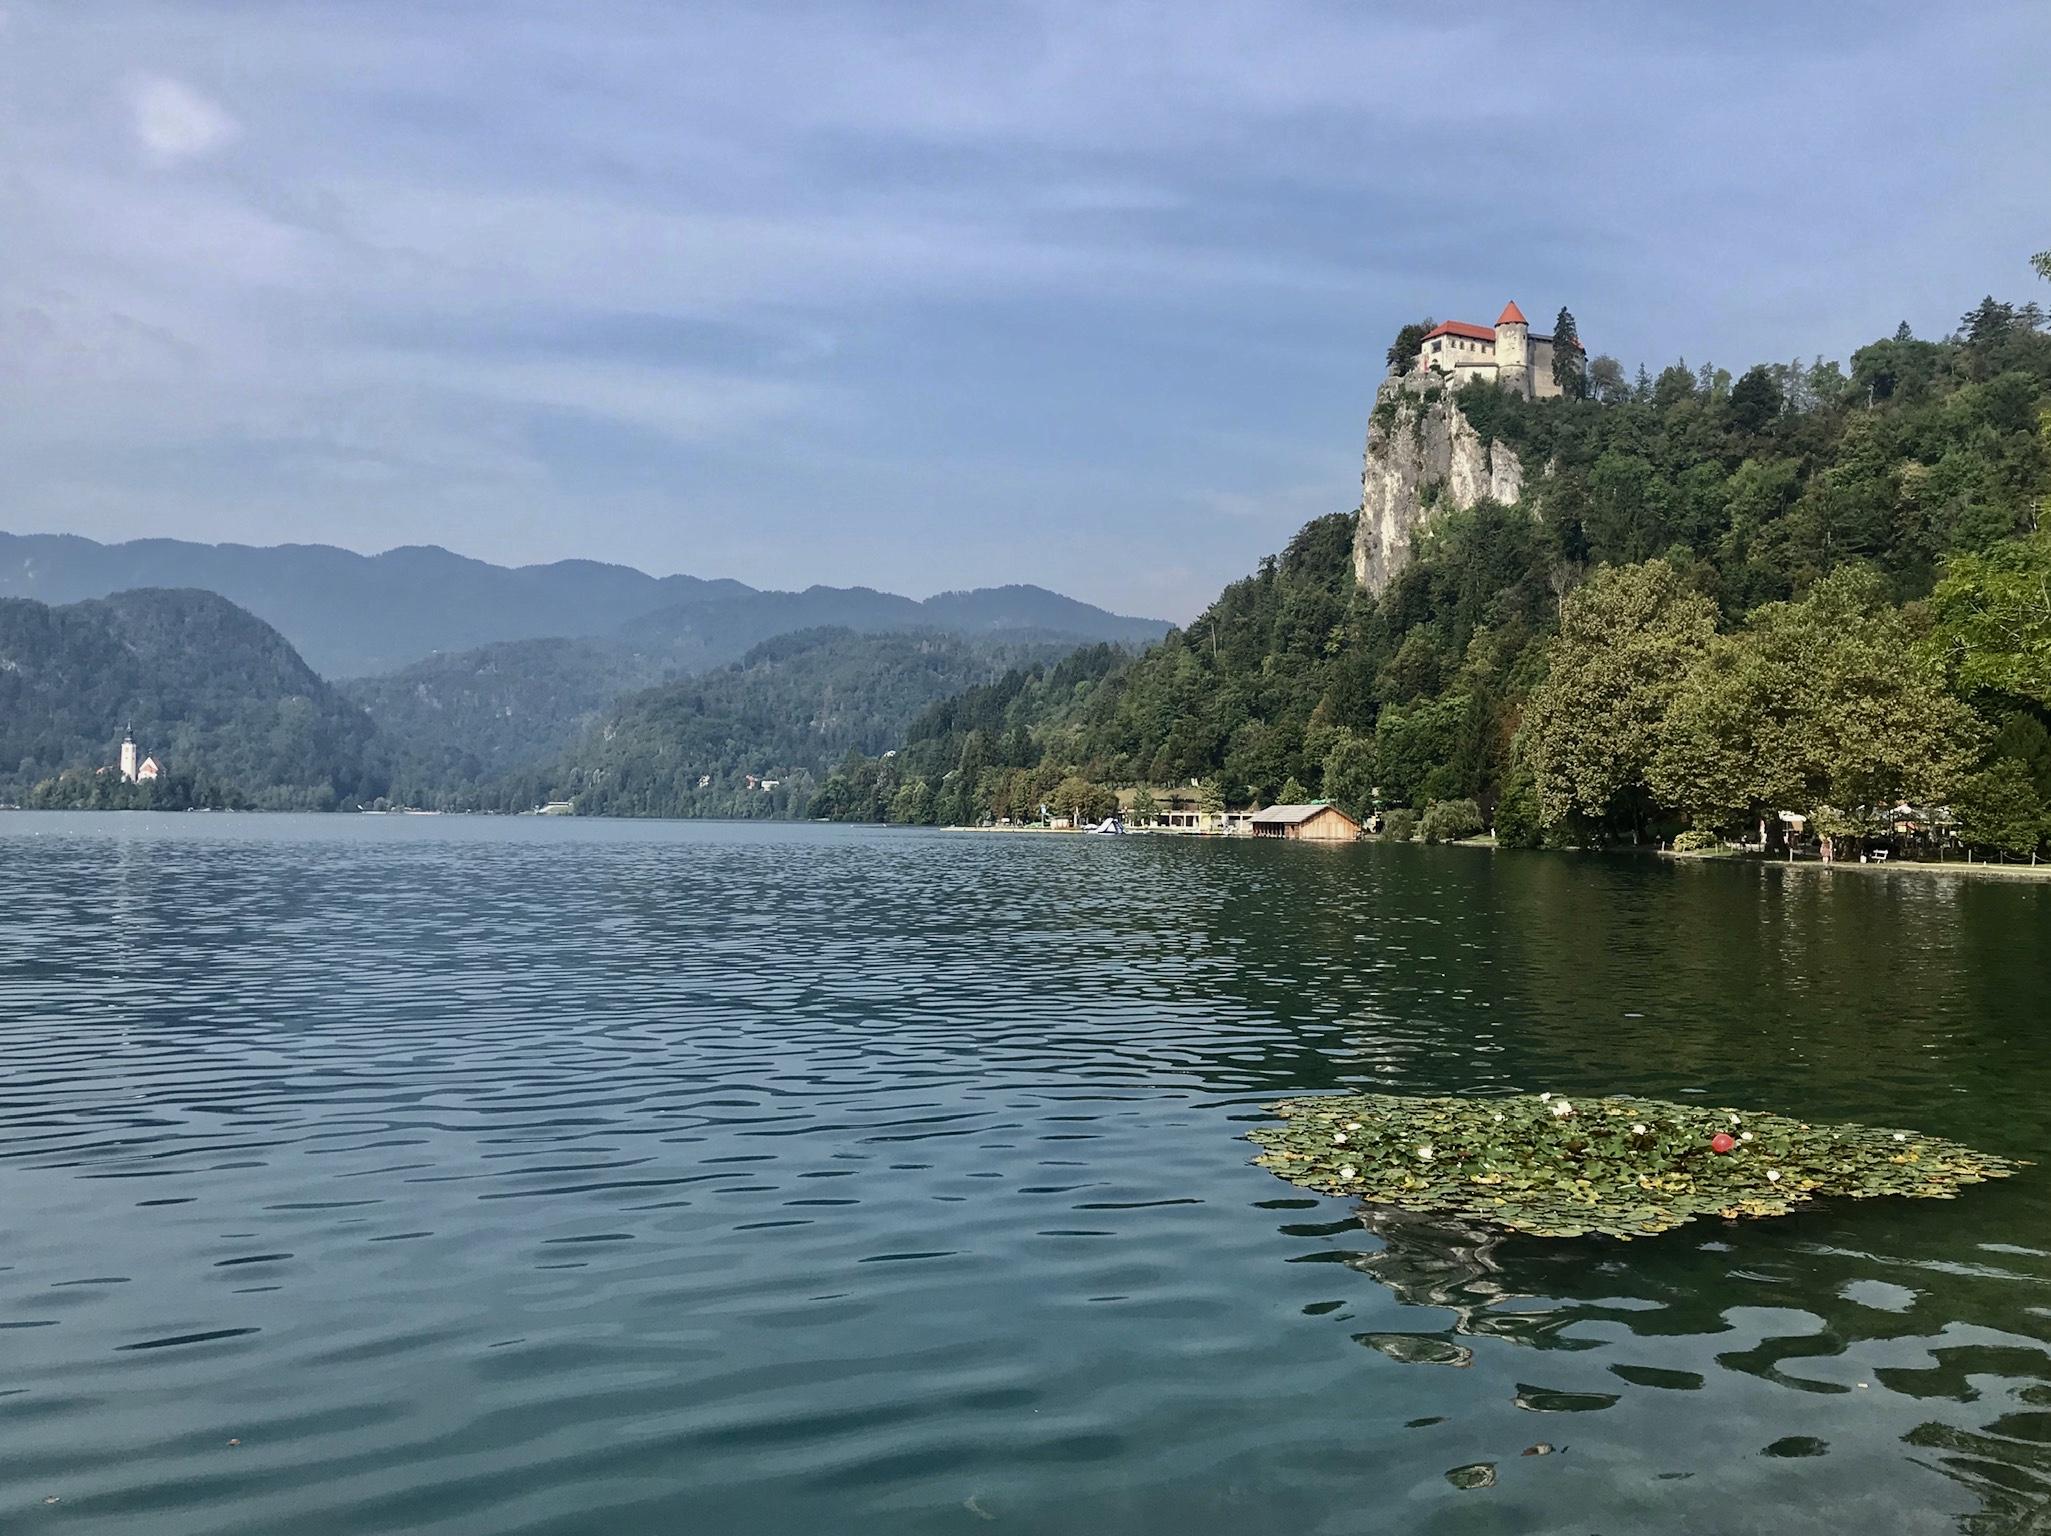 Bledsjön med slottet på klippan